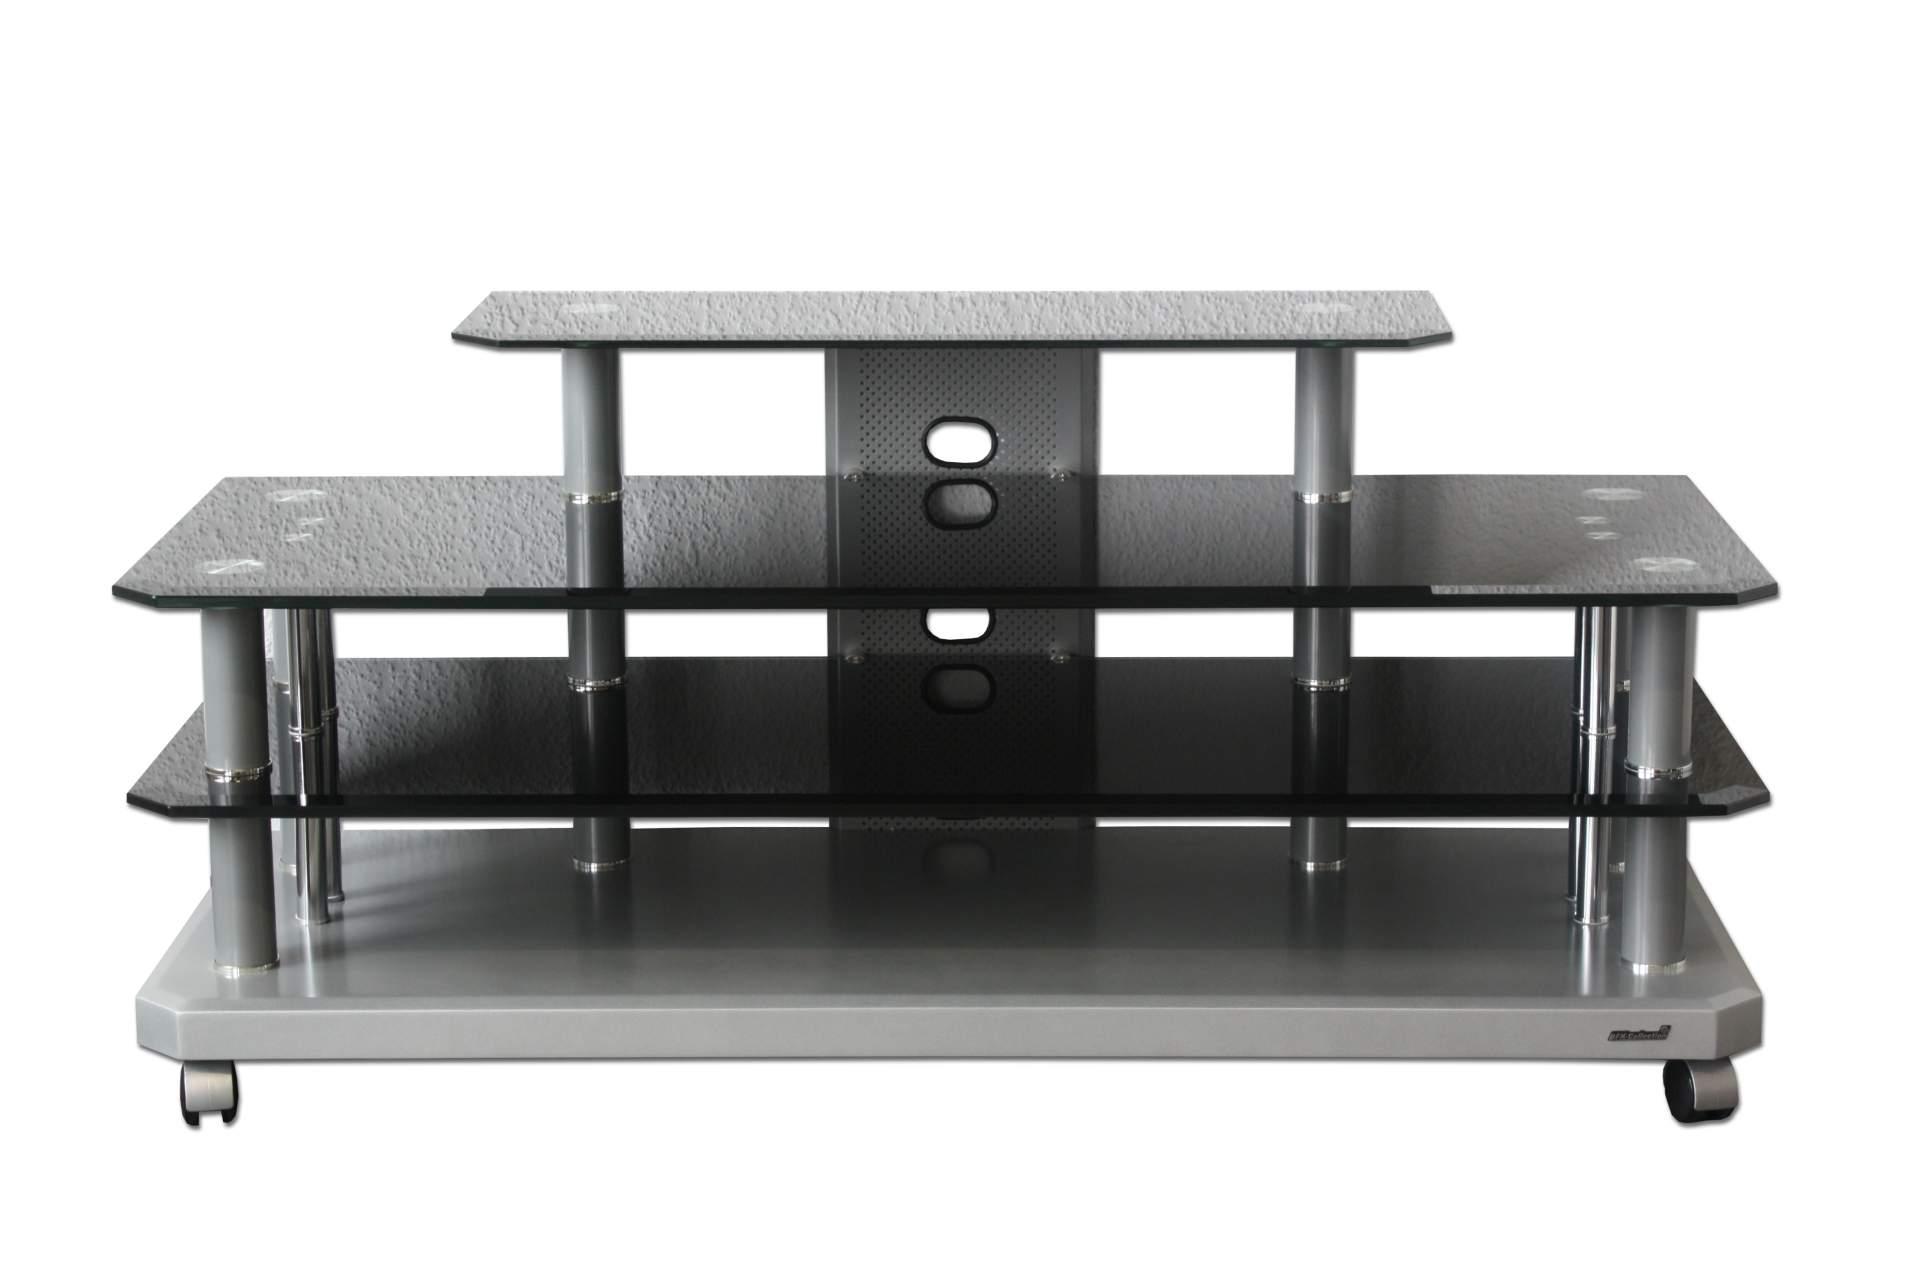 fernsehtisch glas pluto phono hifi audio ablage regal. Black Bedroom Furniture Sets. Home Design Ideas